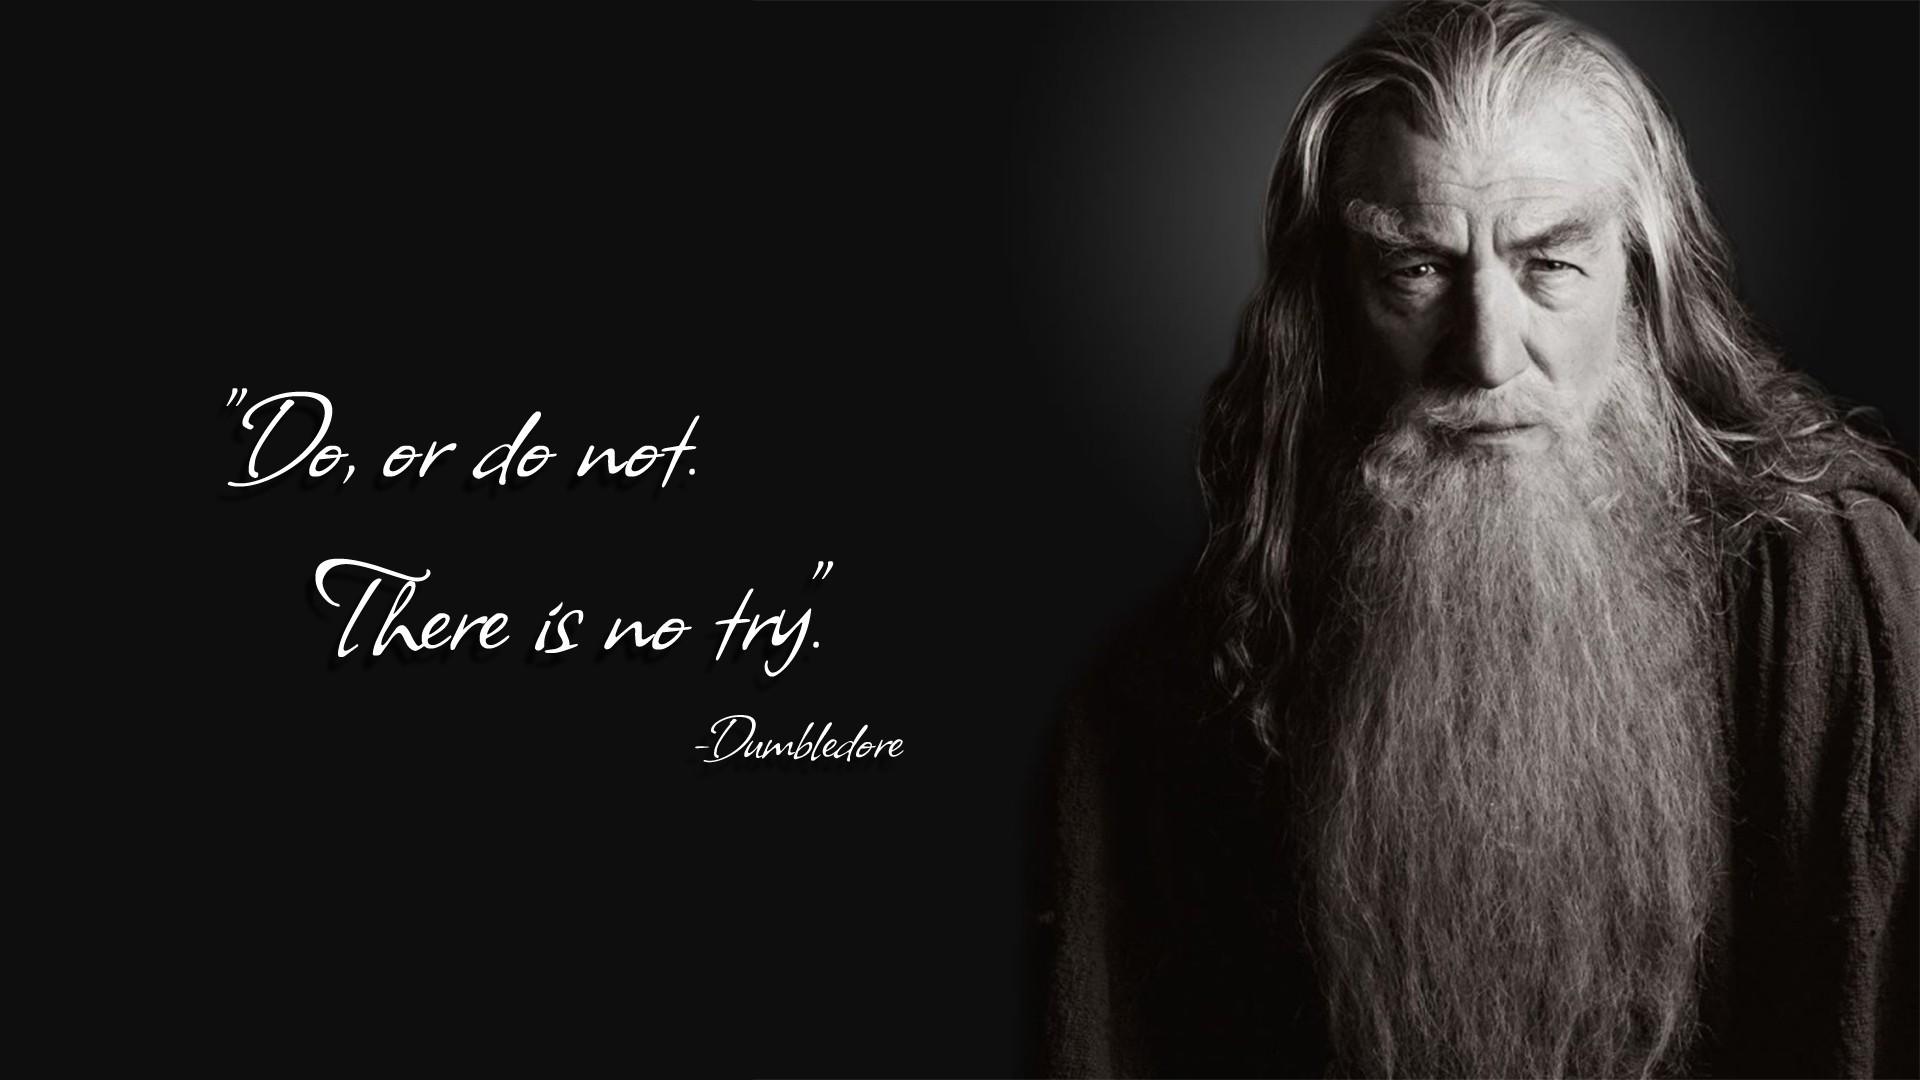 Wallpaper 1920x1080 Px Albus Dumbledore Gandalf Harry Potter